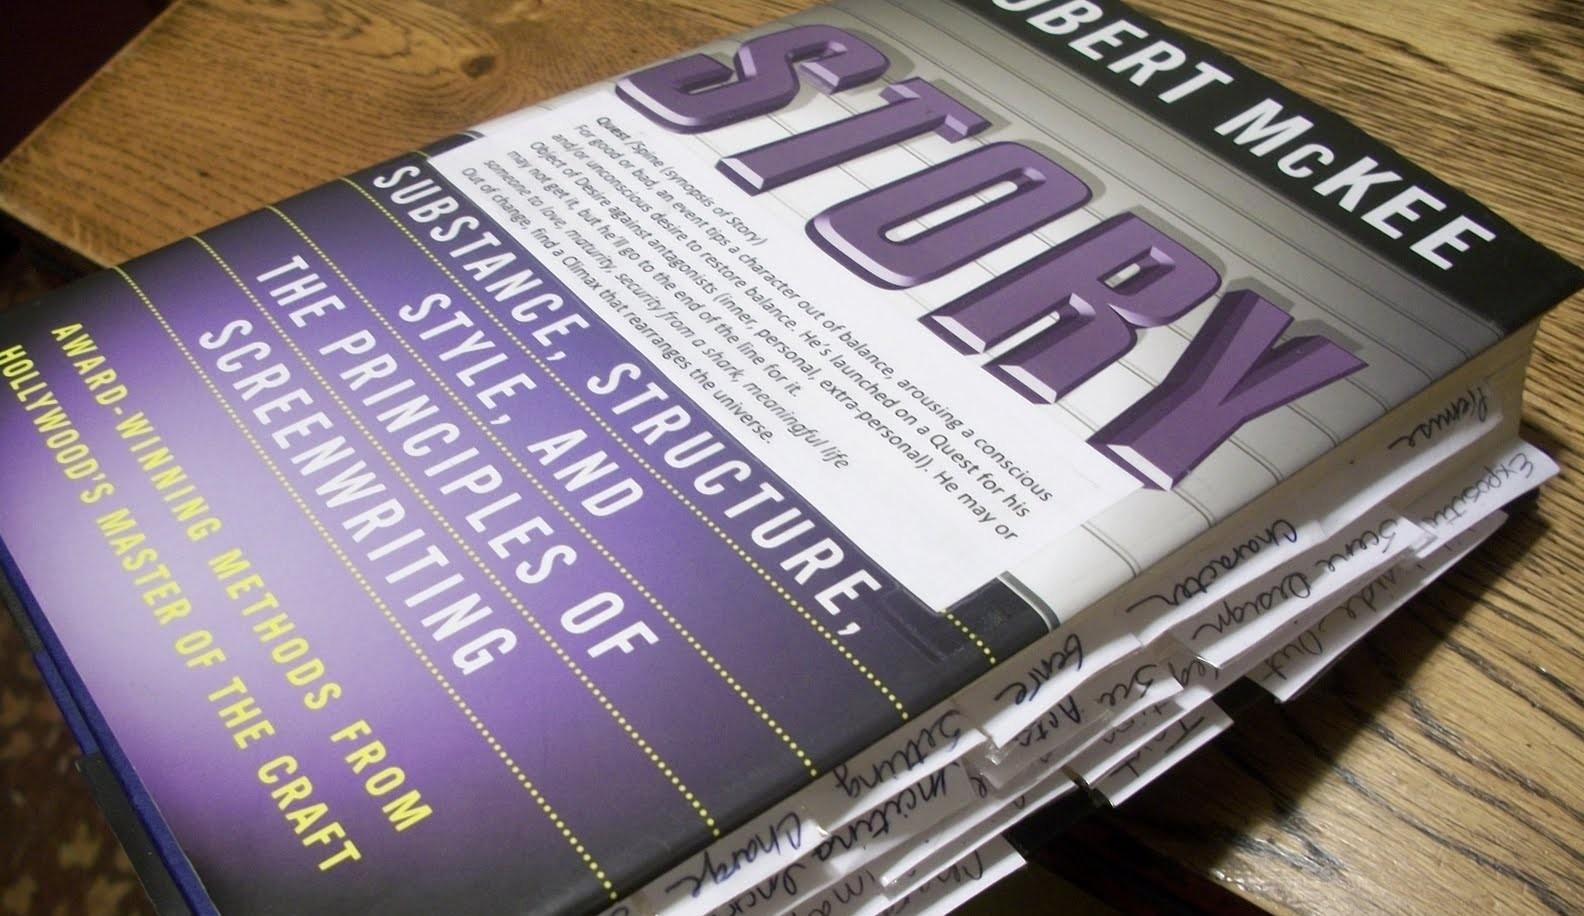 Best Screenwriting Books: McKee's STORY (1) - thescriptblog.com